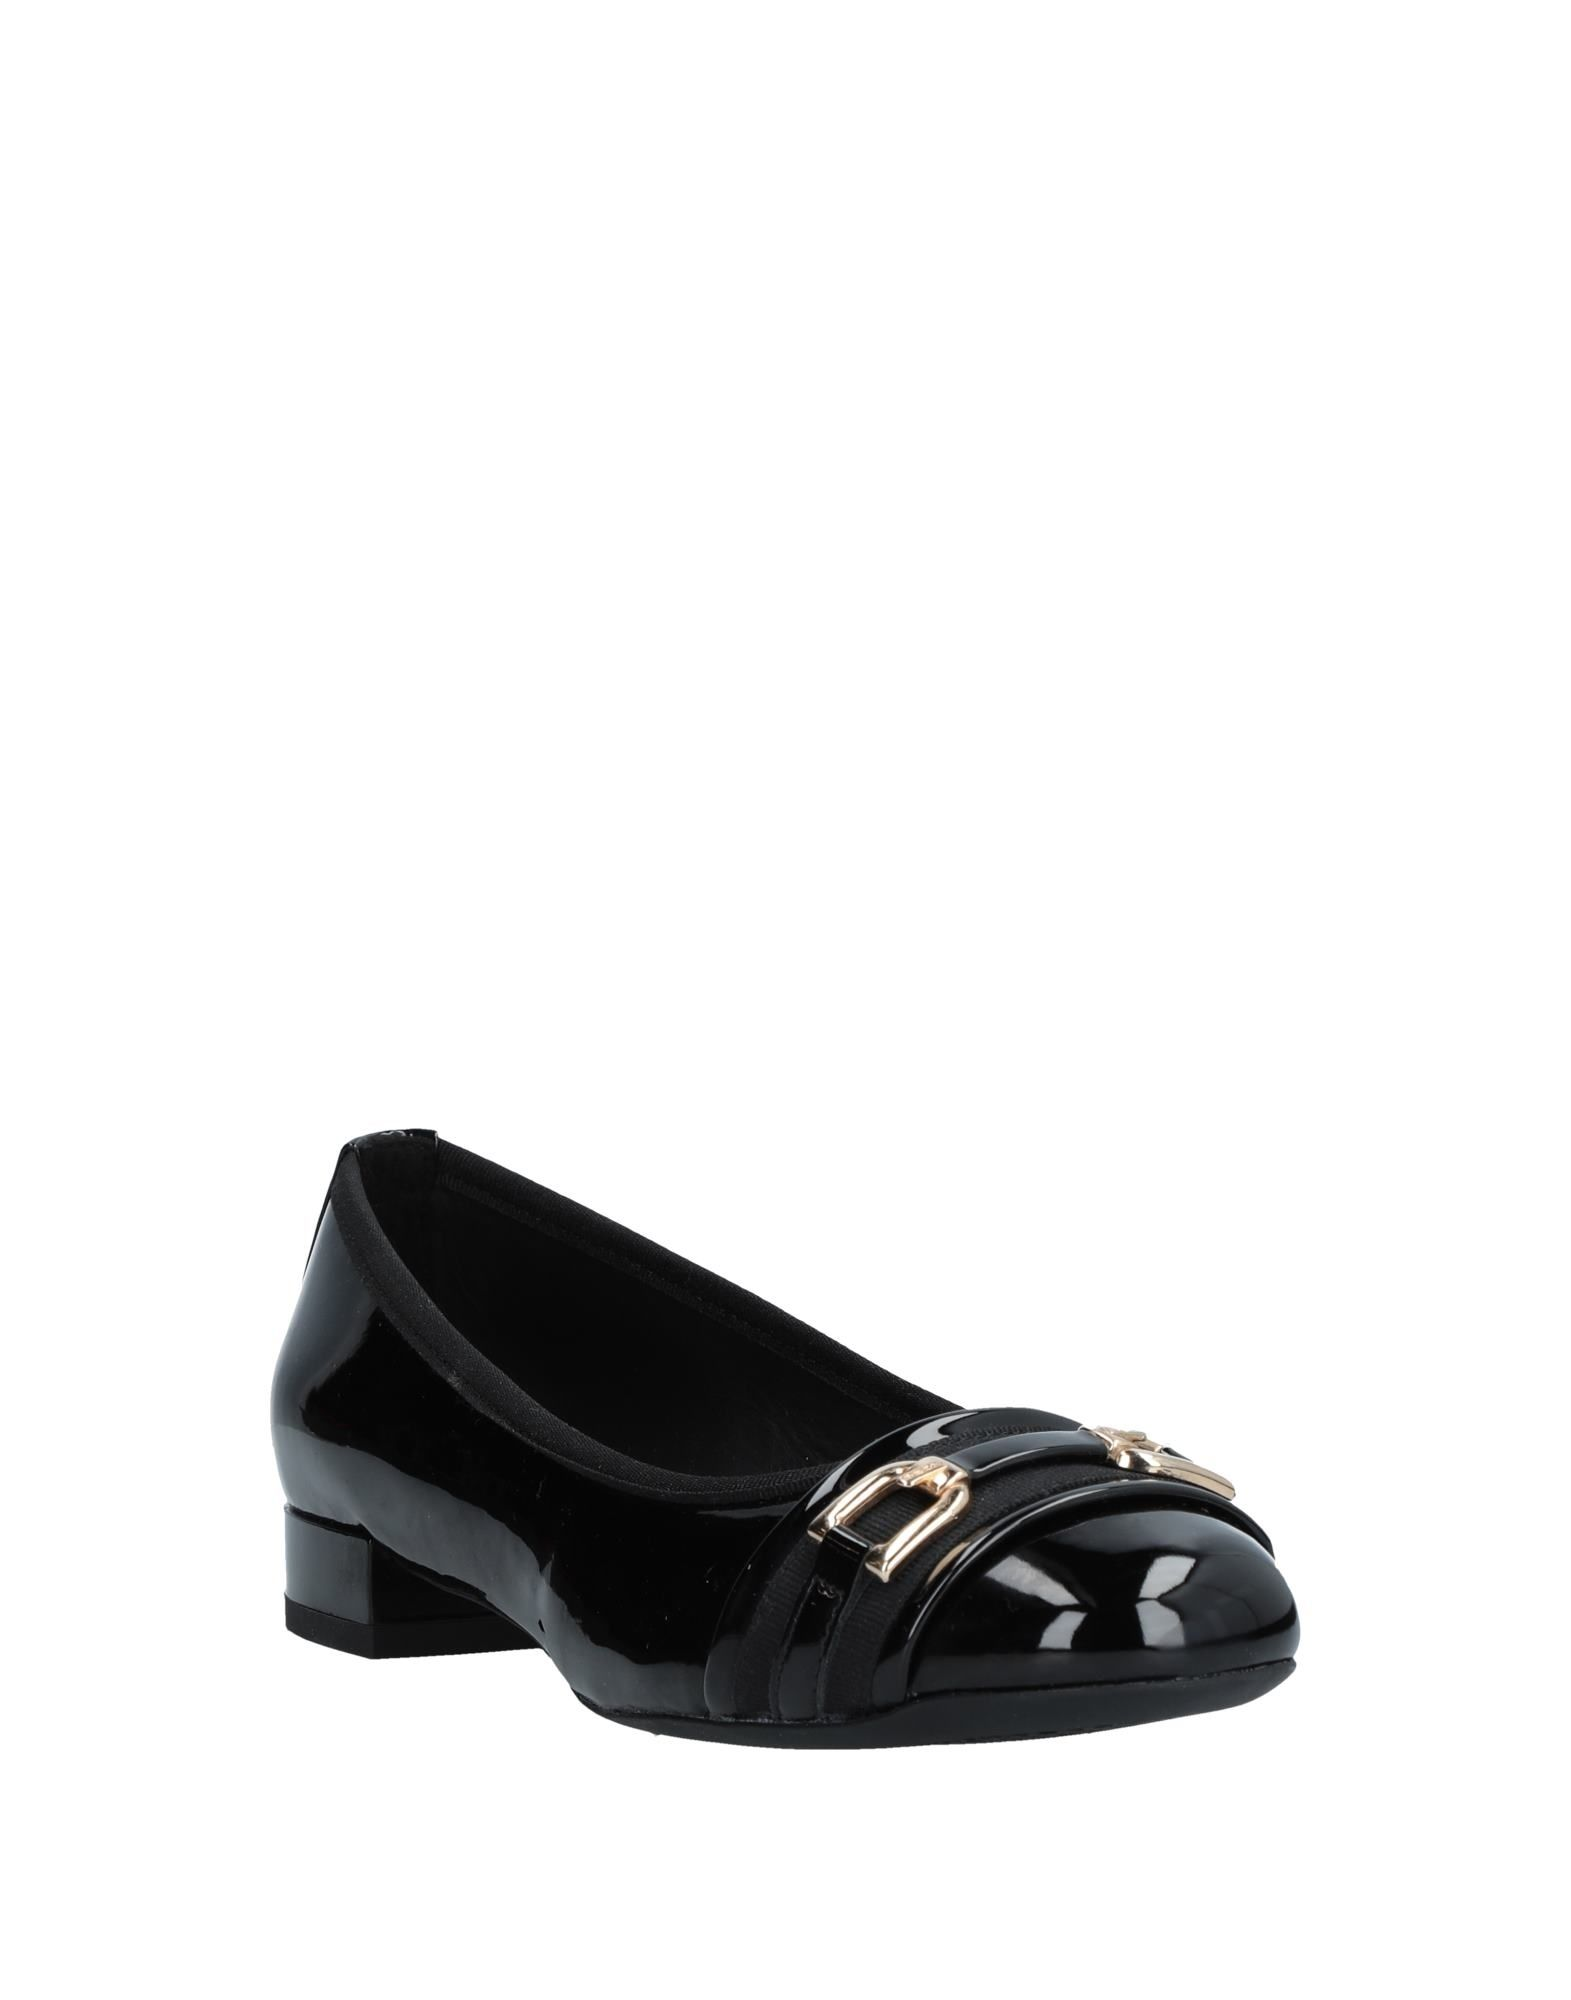 Gut Gut Gut um billige Schuhe zu tragenGeox Ballerinas Damen  11541947PU 918925